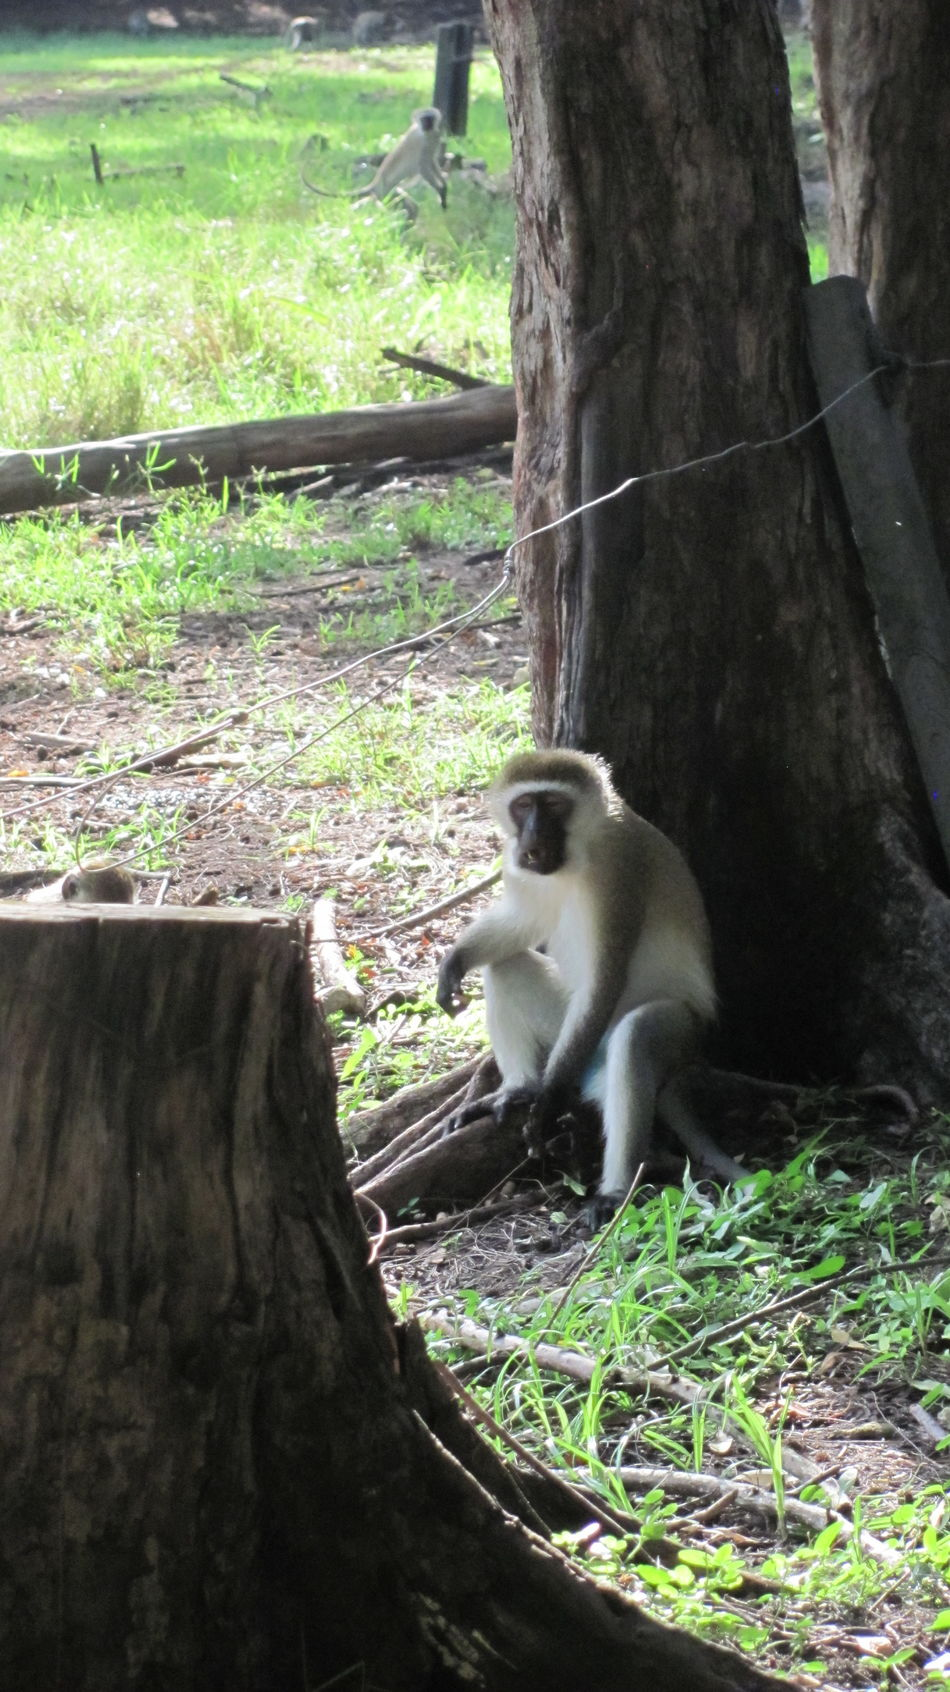 Animal Animal Themes Forest Mammal Monkey Monkey Sitting Tree Trunk Animals Animal Photography Animal Portrait